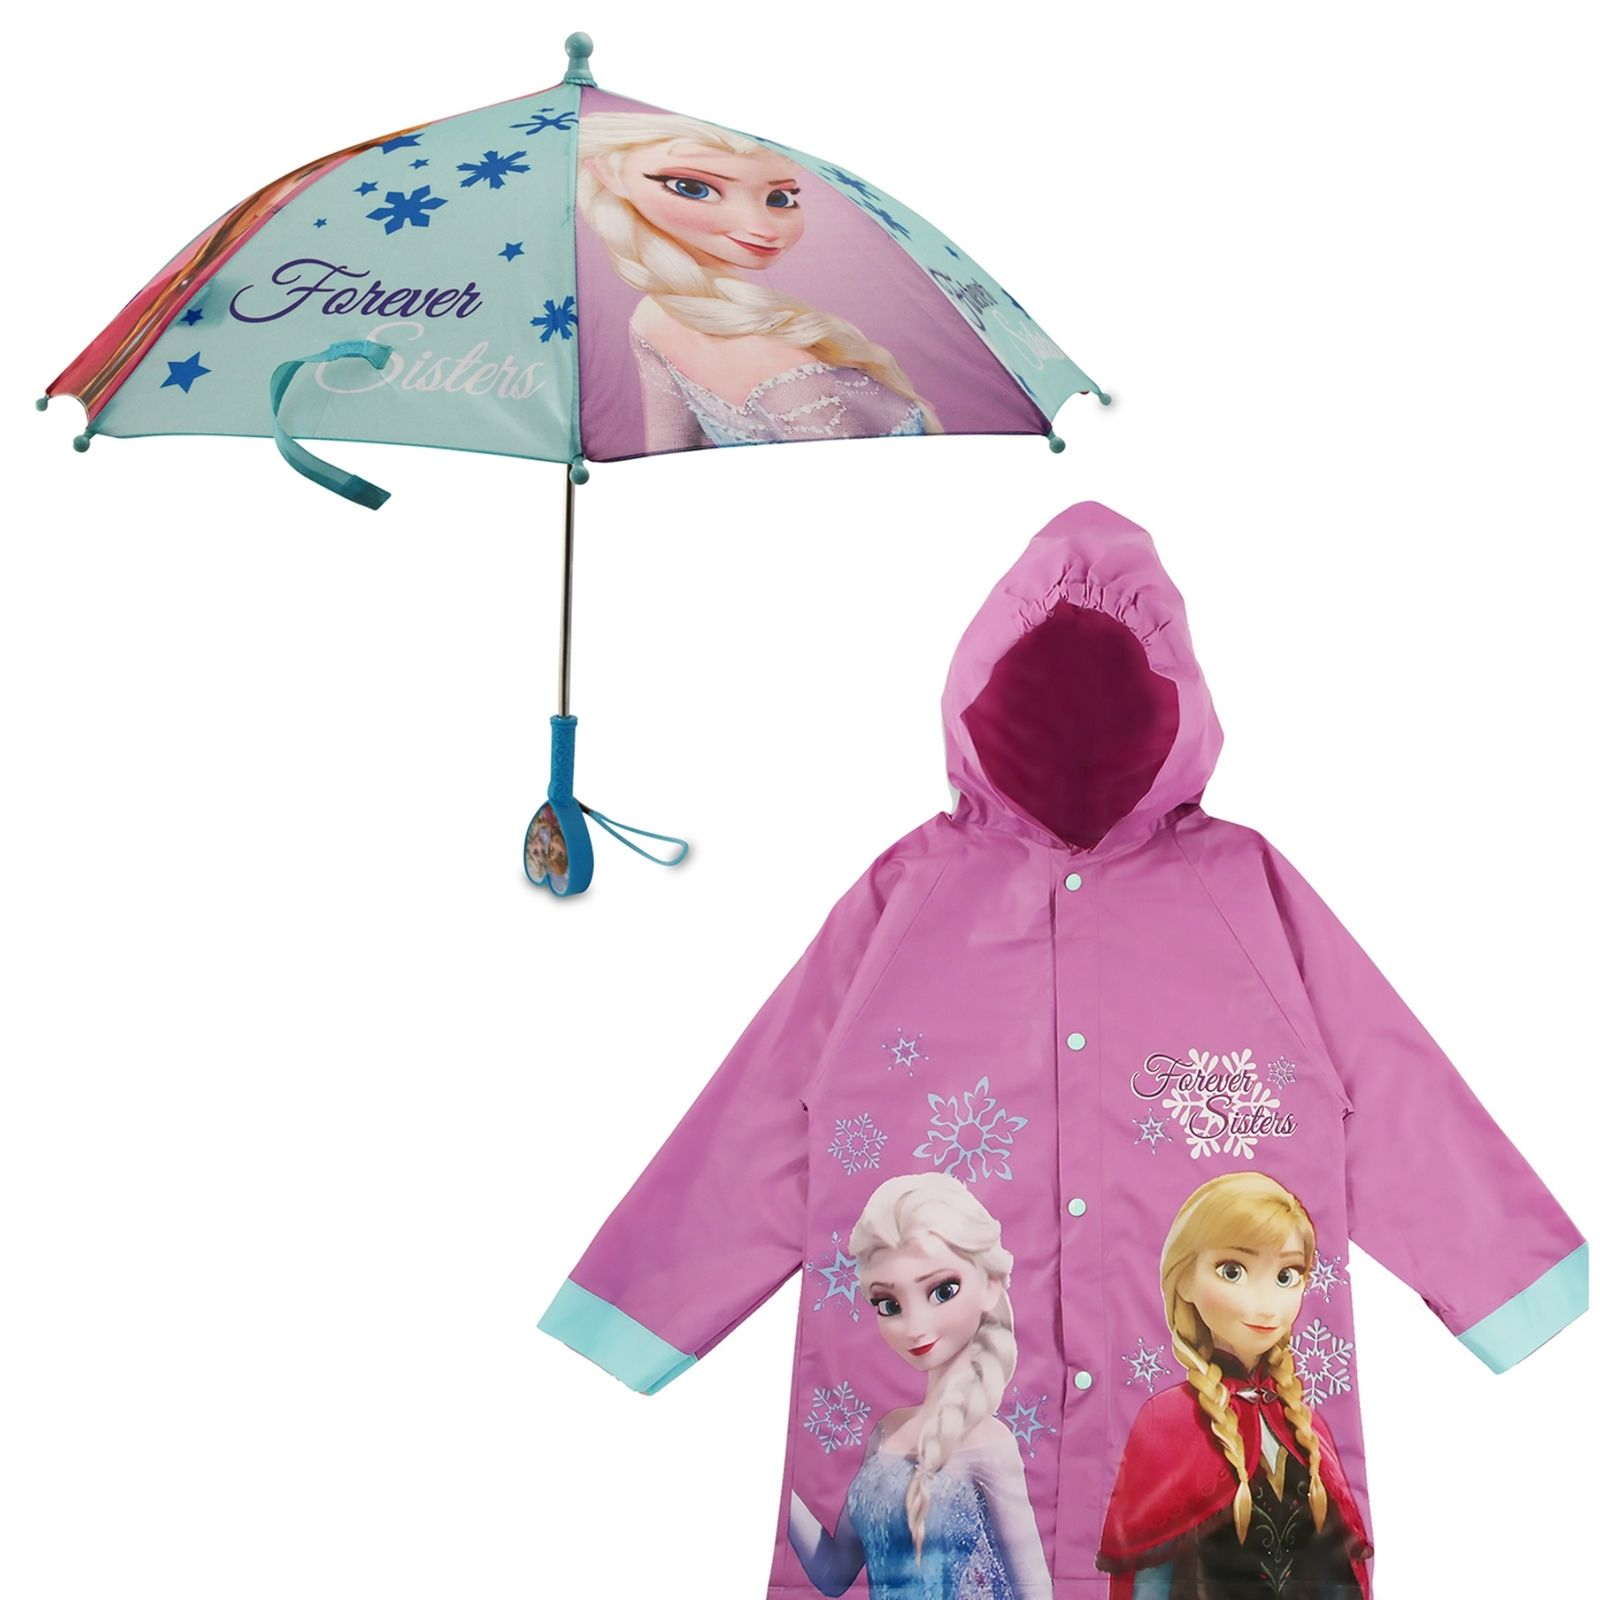 Disneys Princess Childrens Rain Slicker in S//M